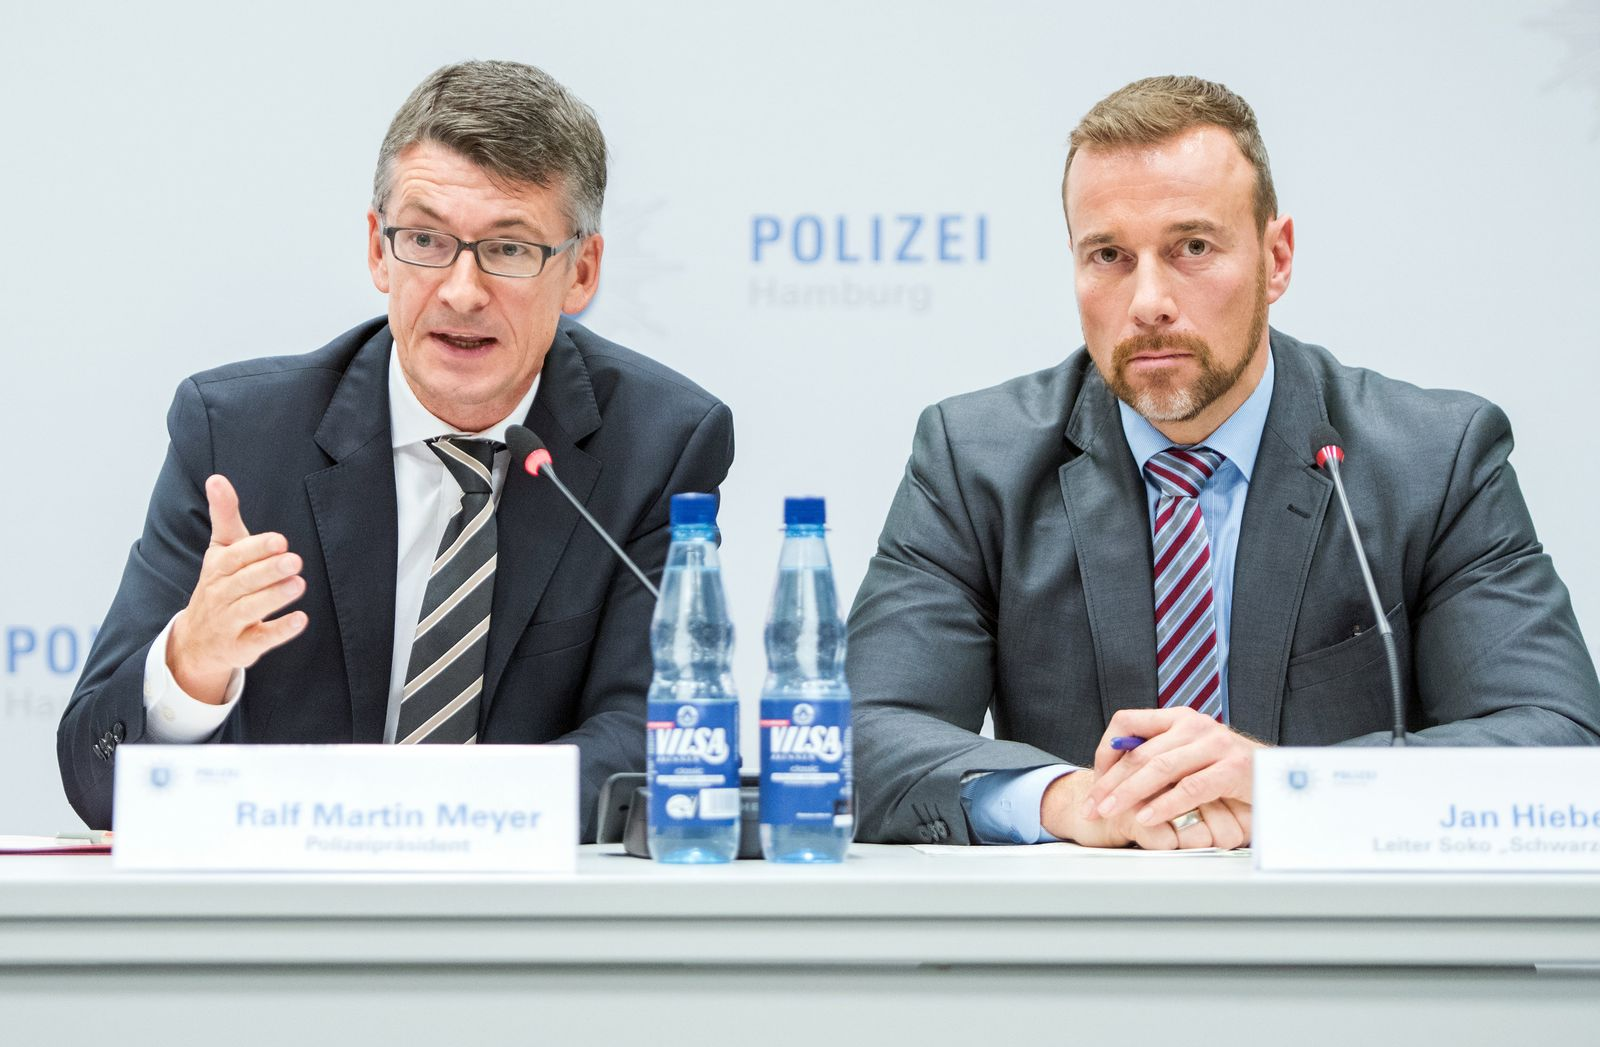 Hieber Meyer G20